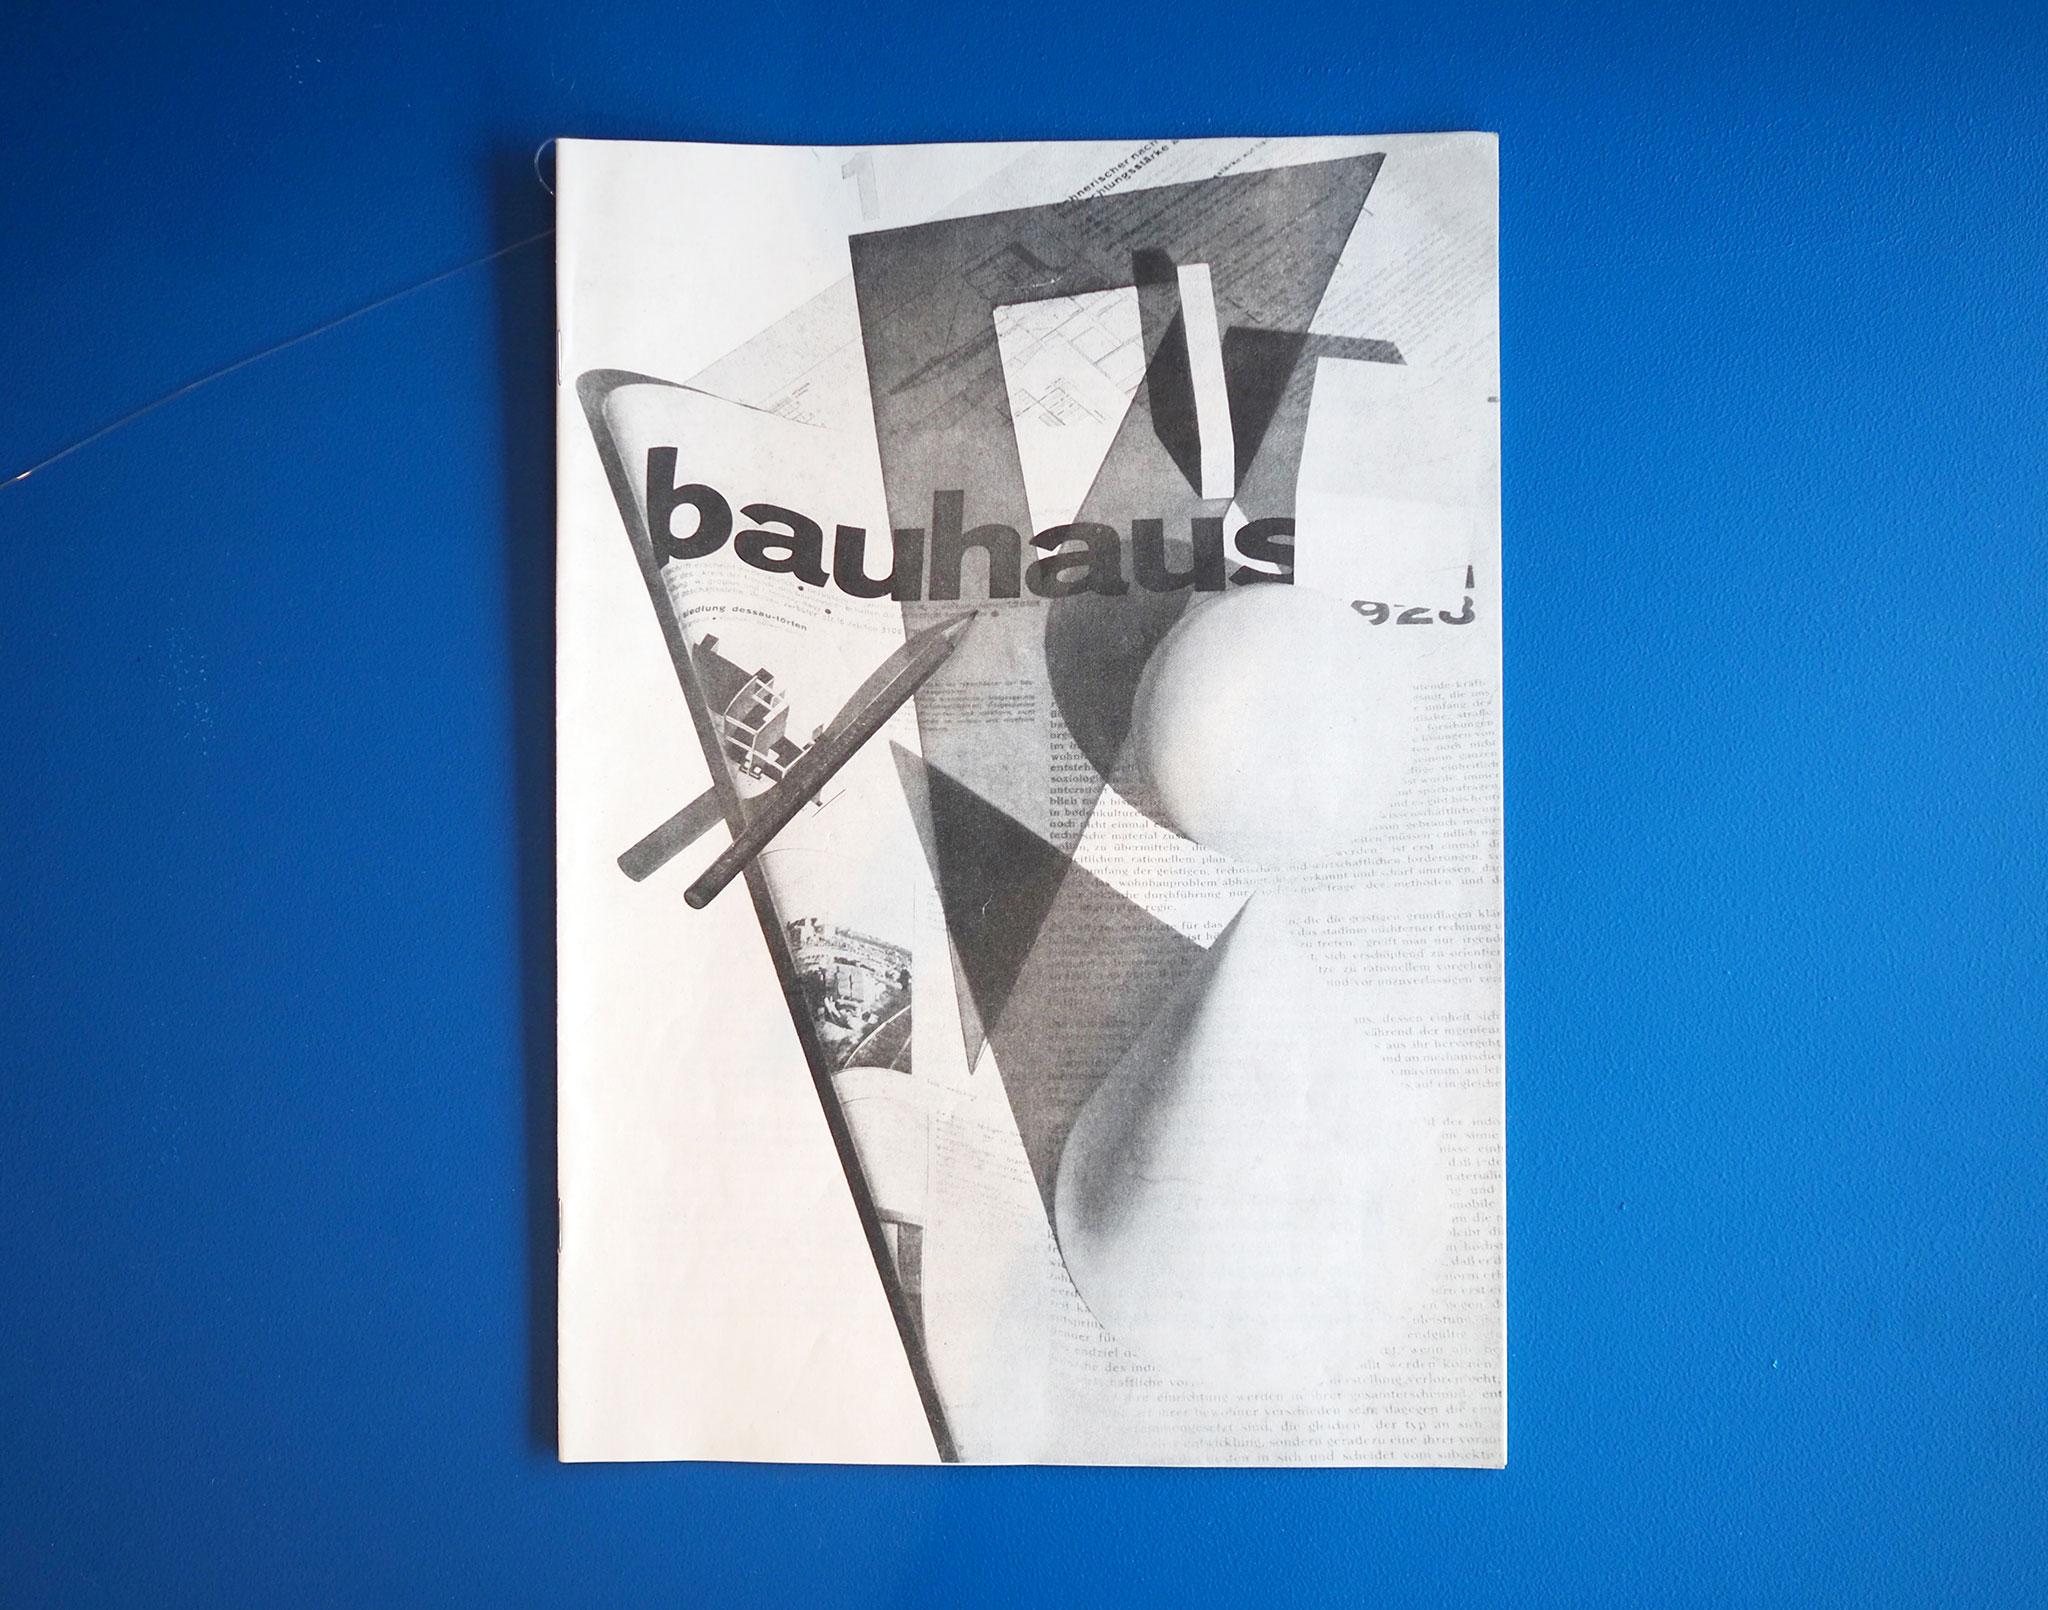 bauhaus-imaginista-slanted-moscow_15